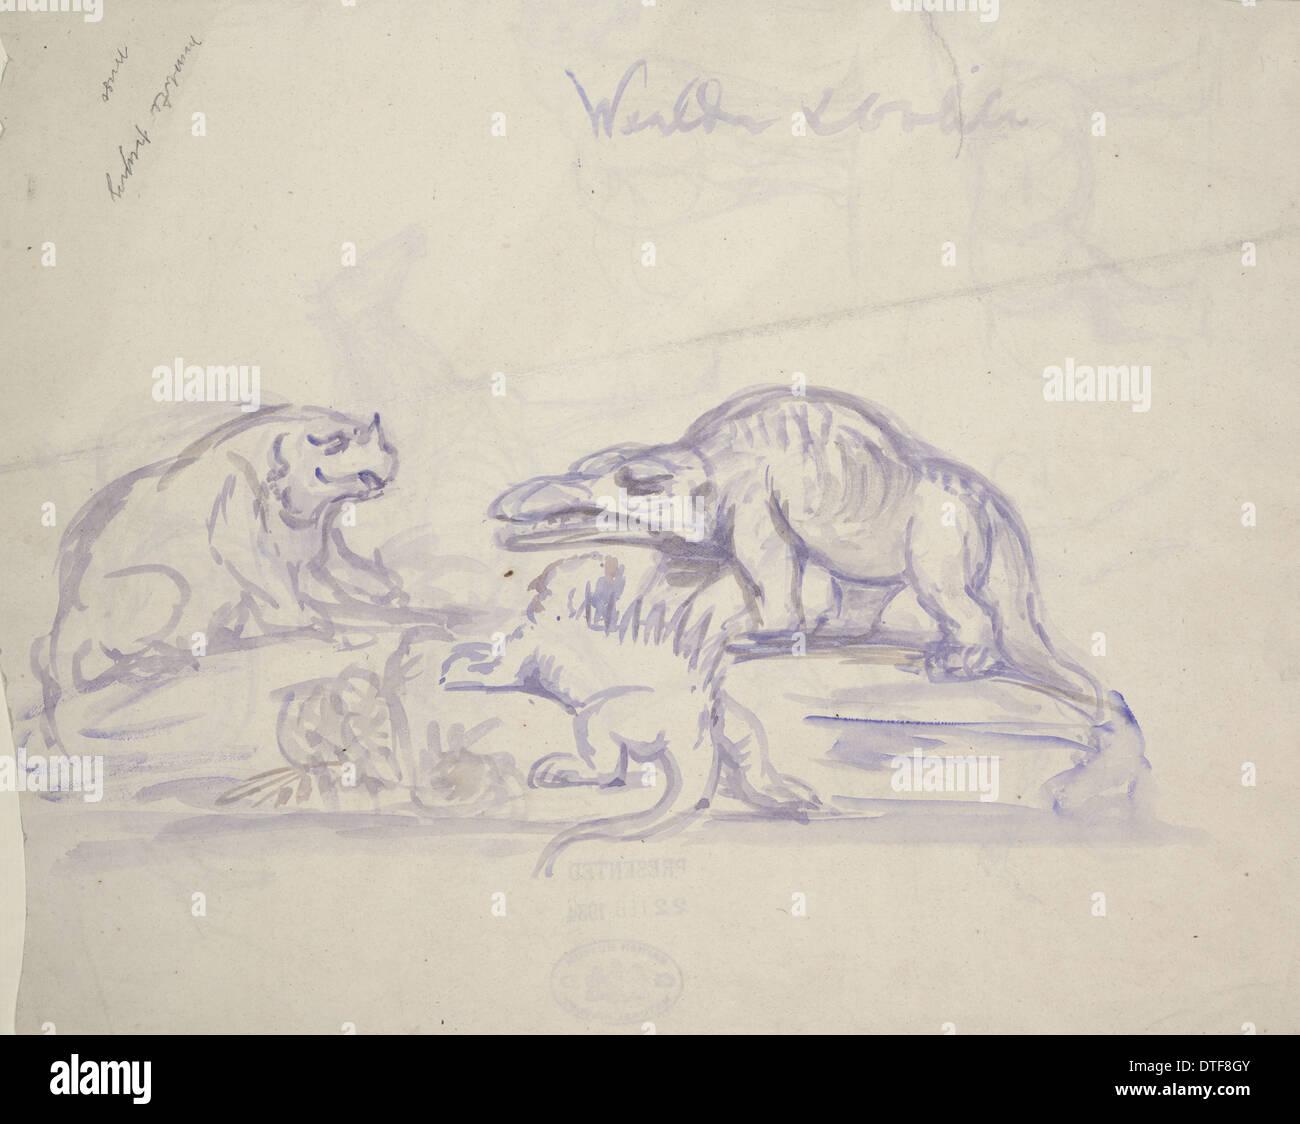 Pre-historic creatures by Benjamin Hawkins - Stock Image